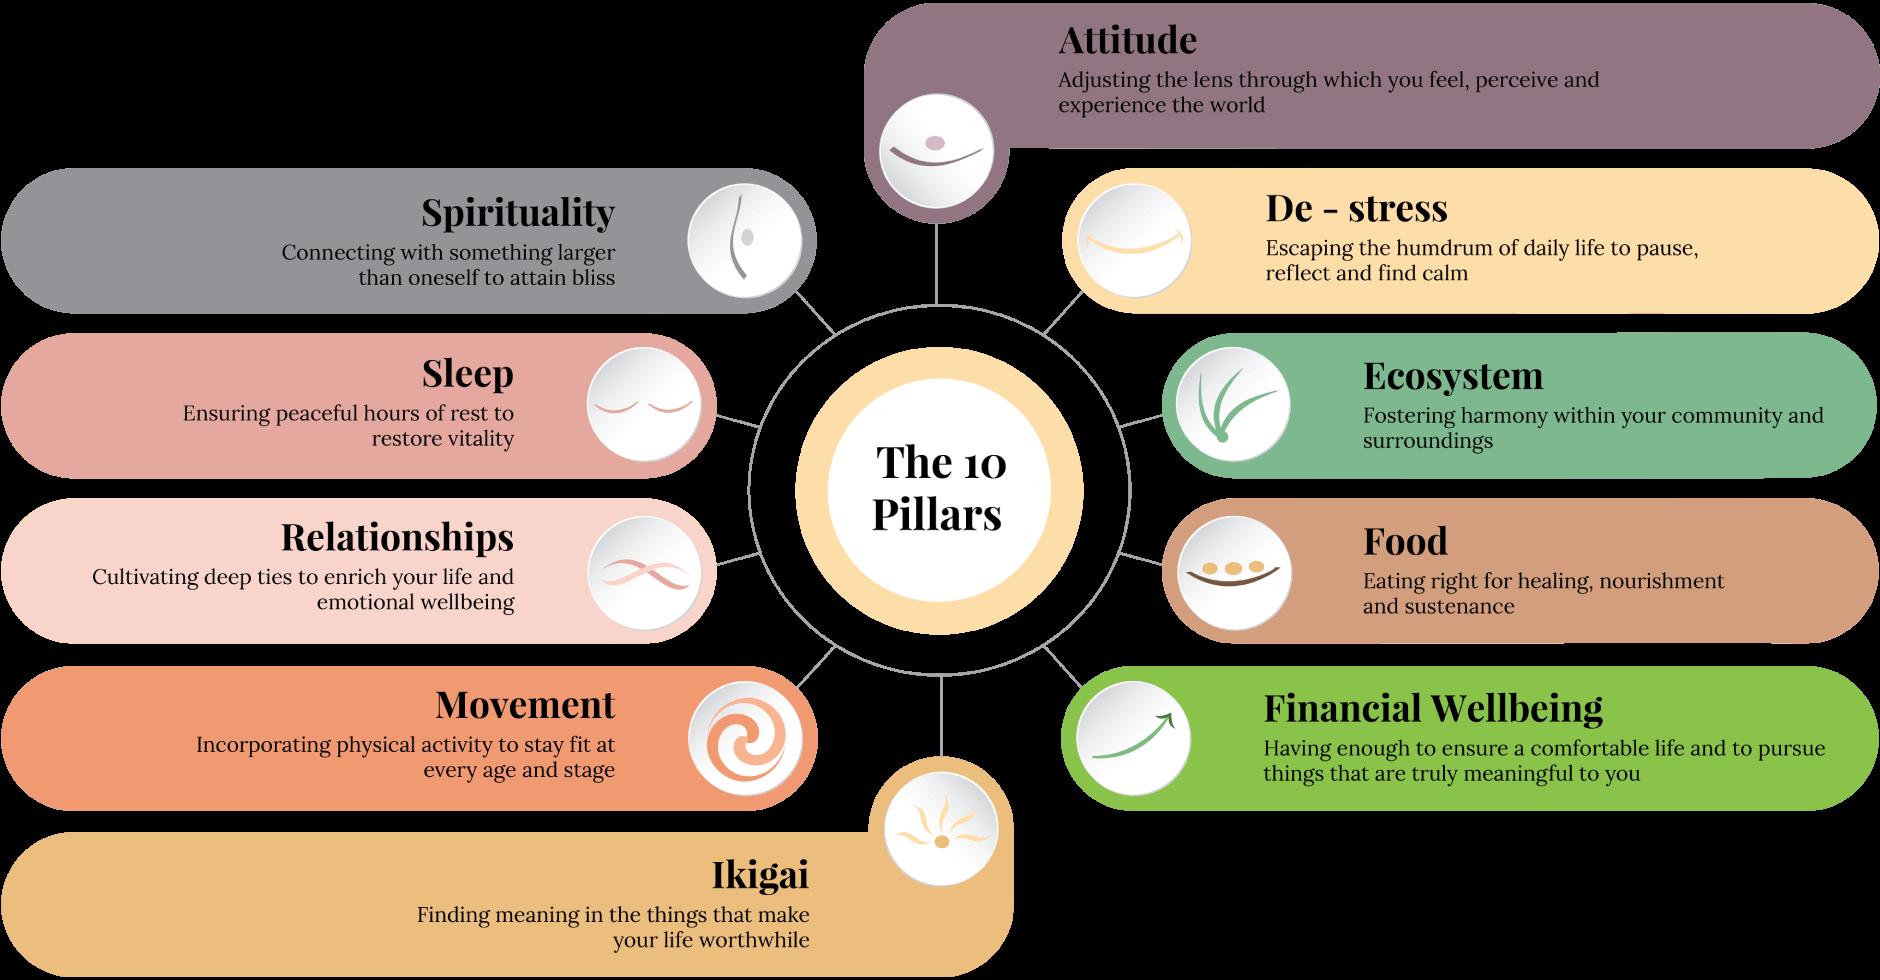 The 10 Pillars of OmniLife